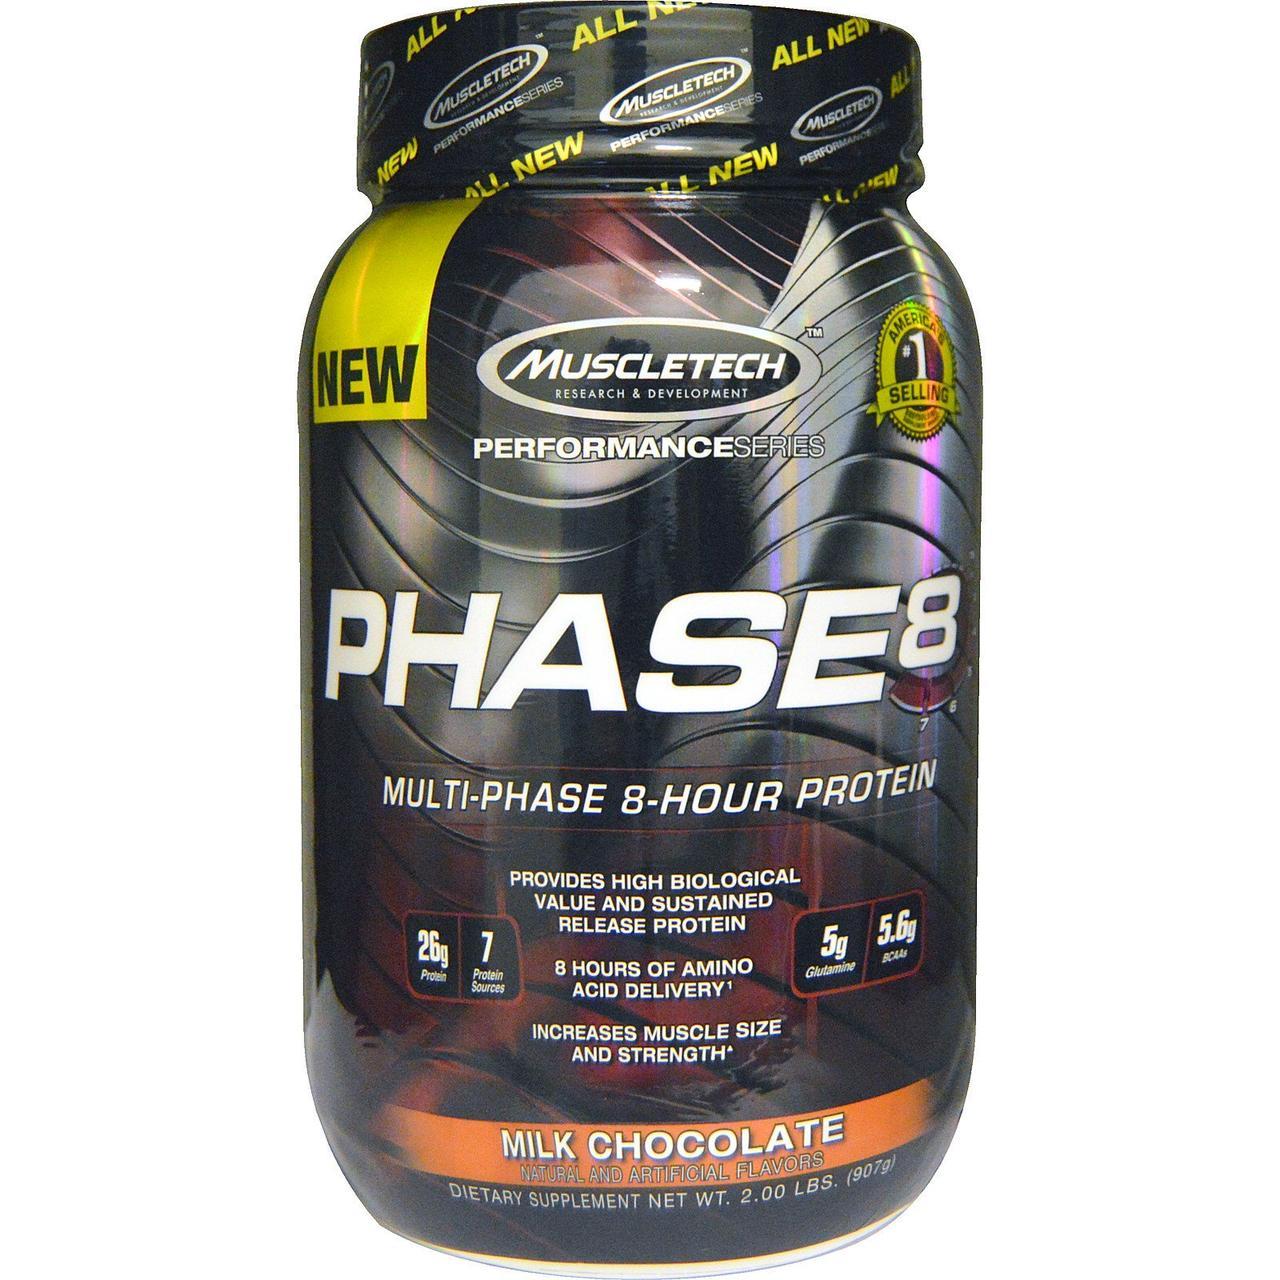 Многофазный протеин, молочный шоколад, Phase8, Muscletech, 907 гр.